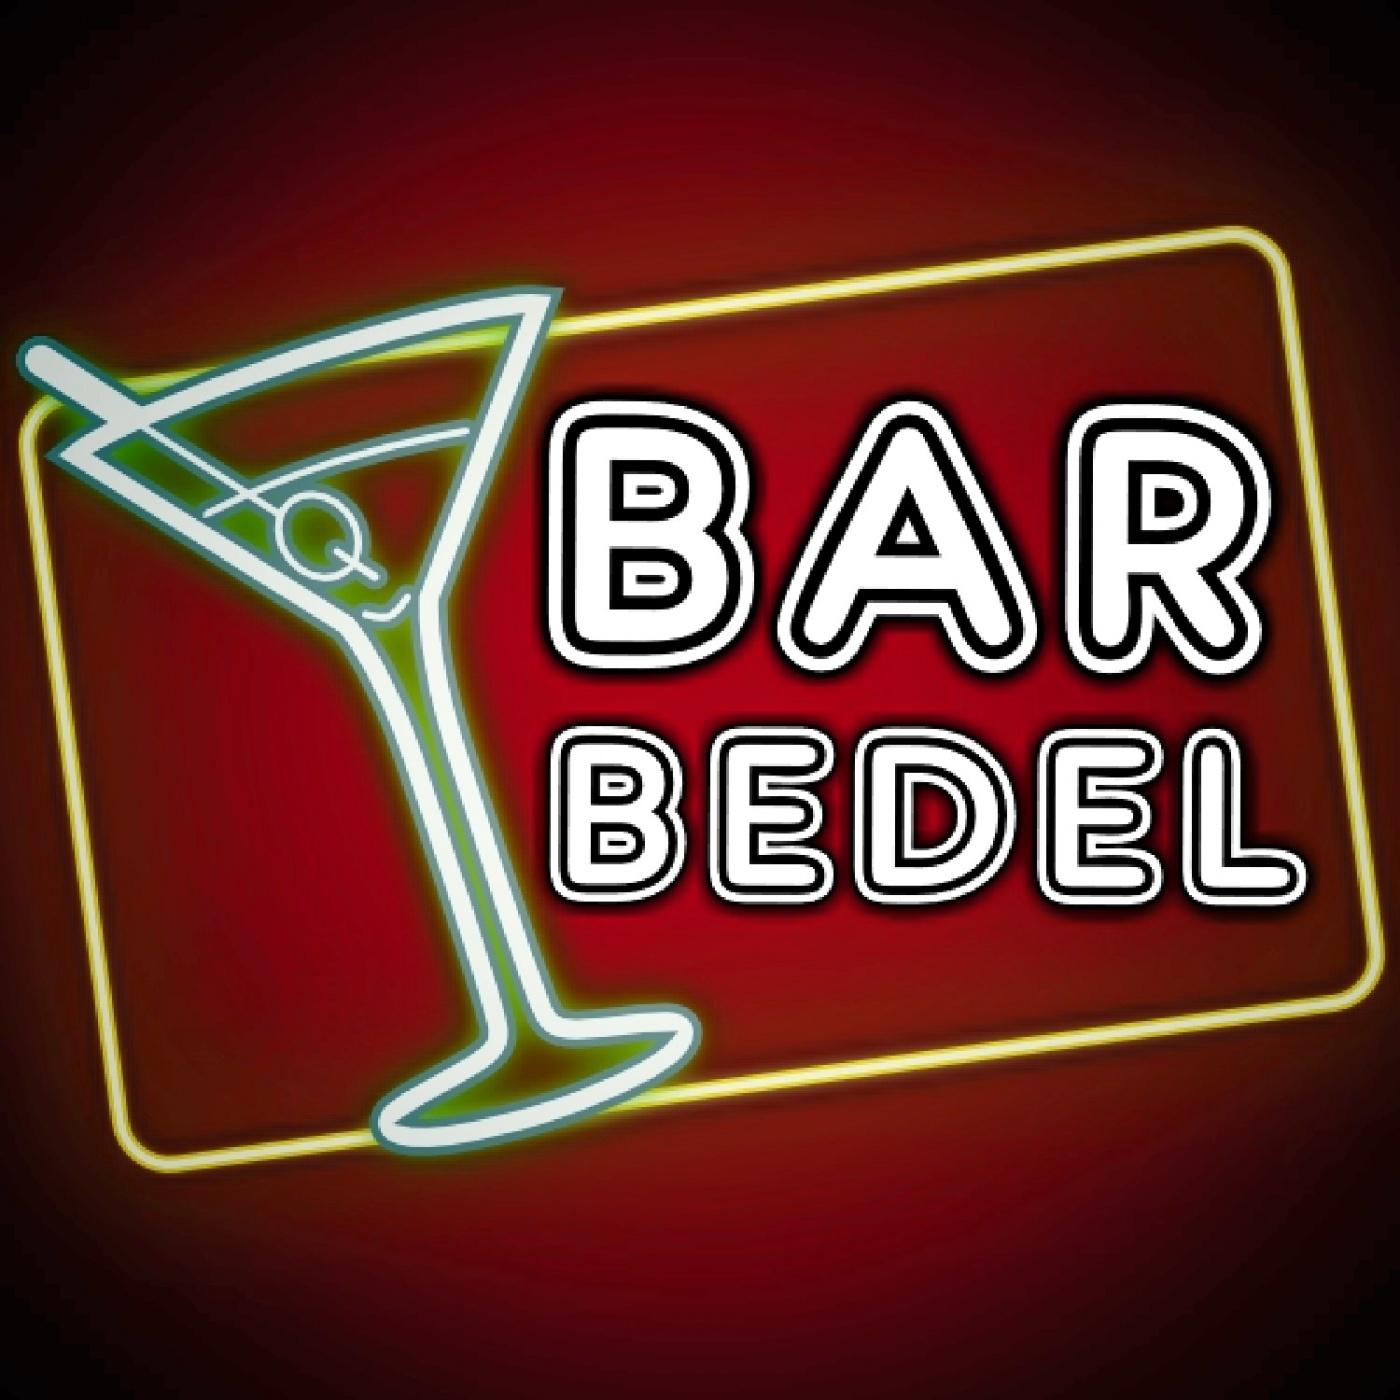 Logo de Bar Bedel | Spreaker